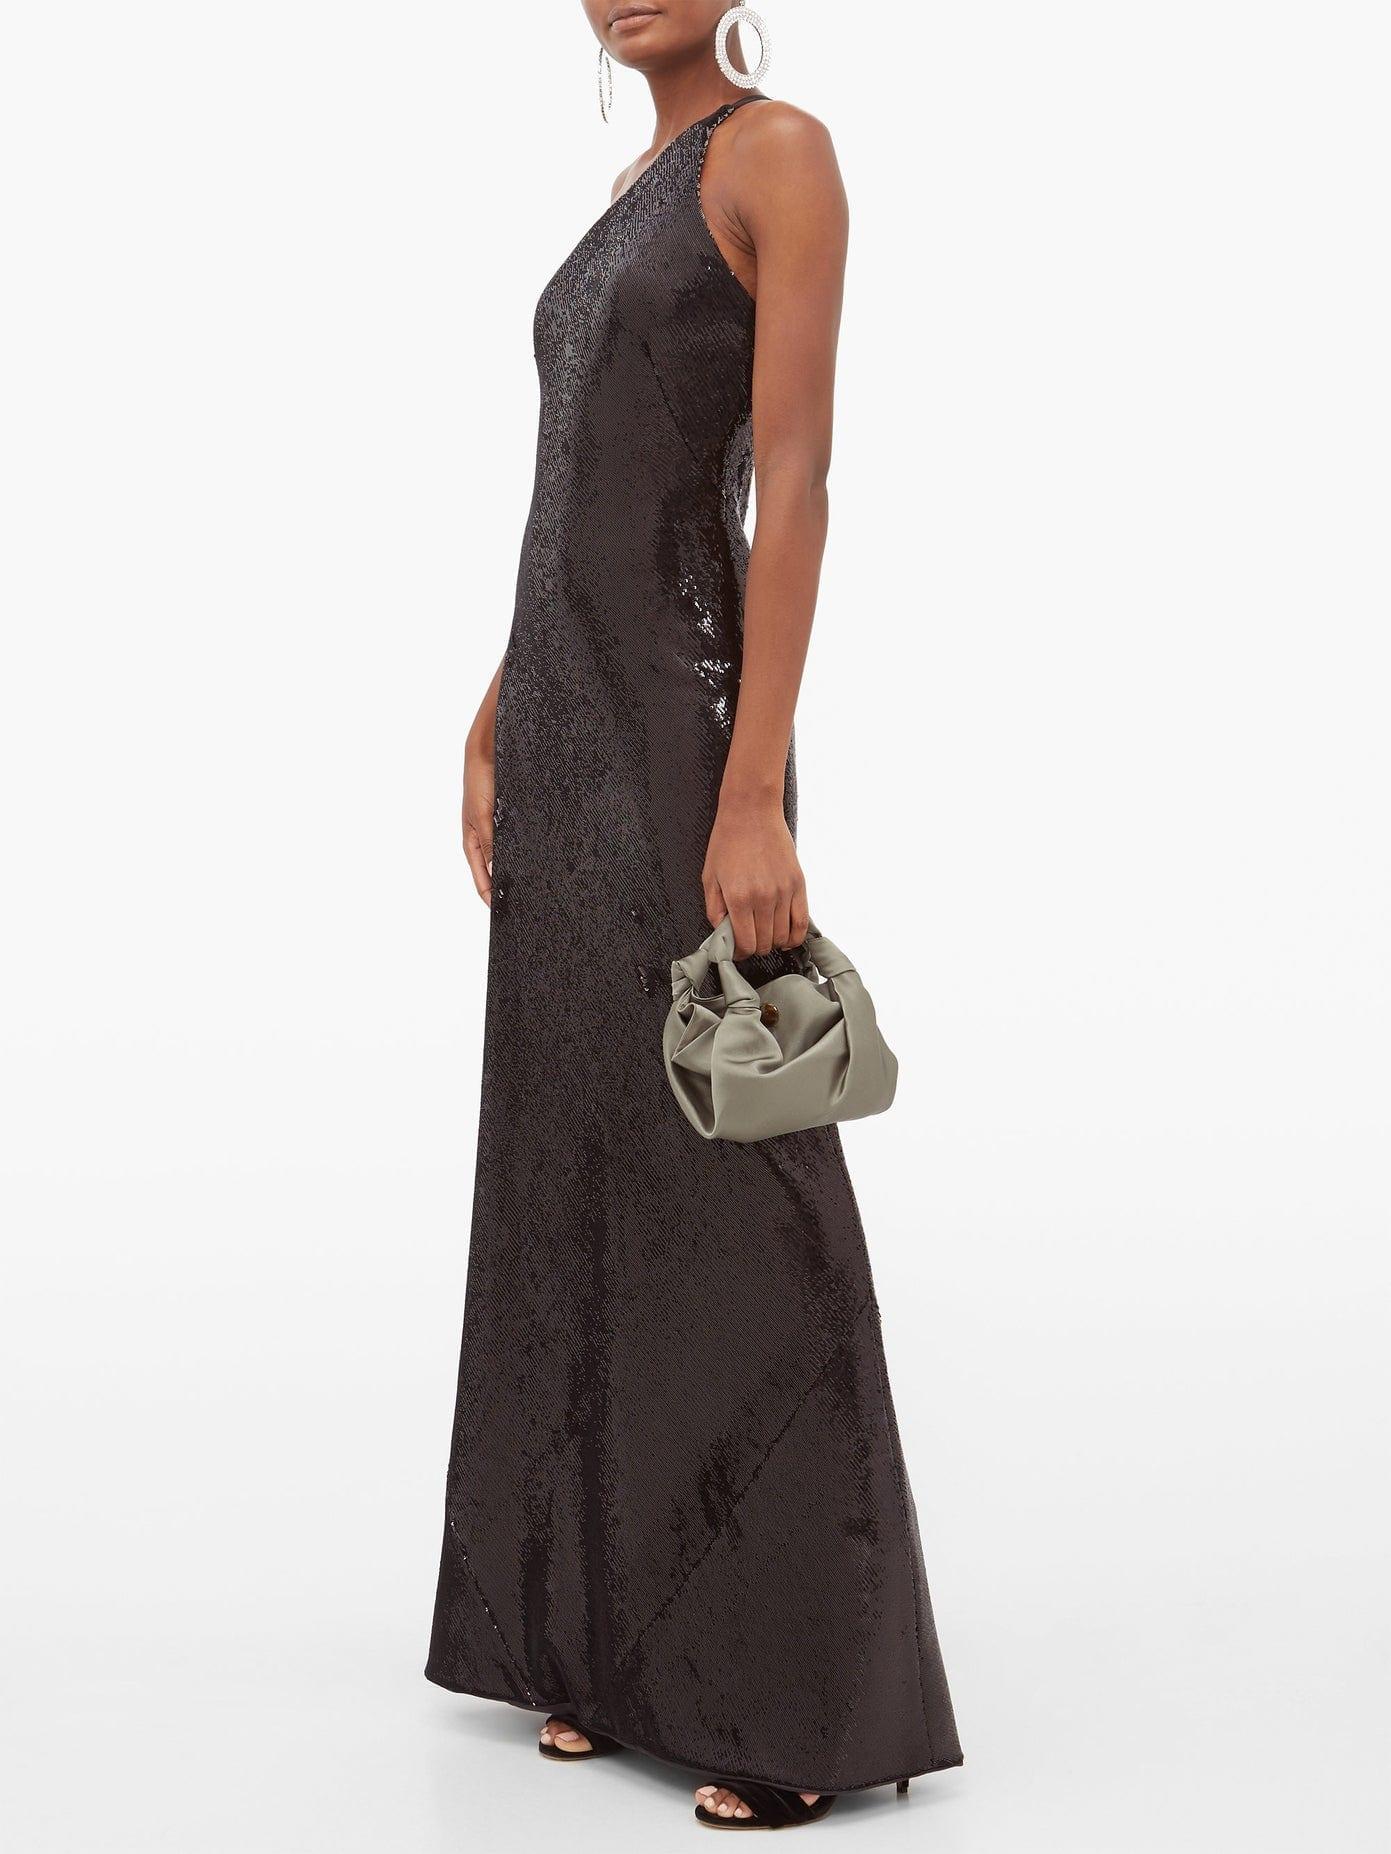 GALVAN Gilded Roxy One-shoulder Sequinned Gown